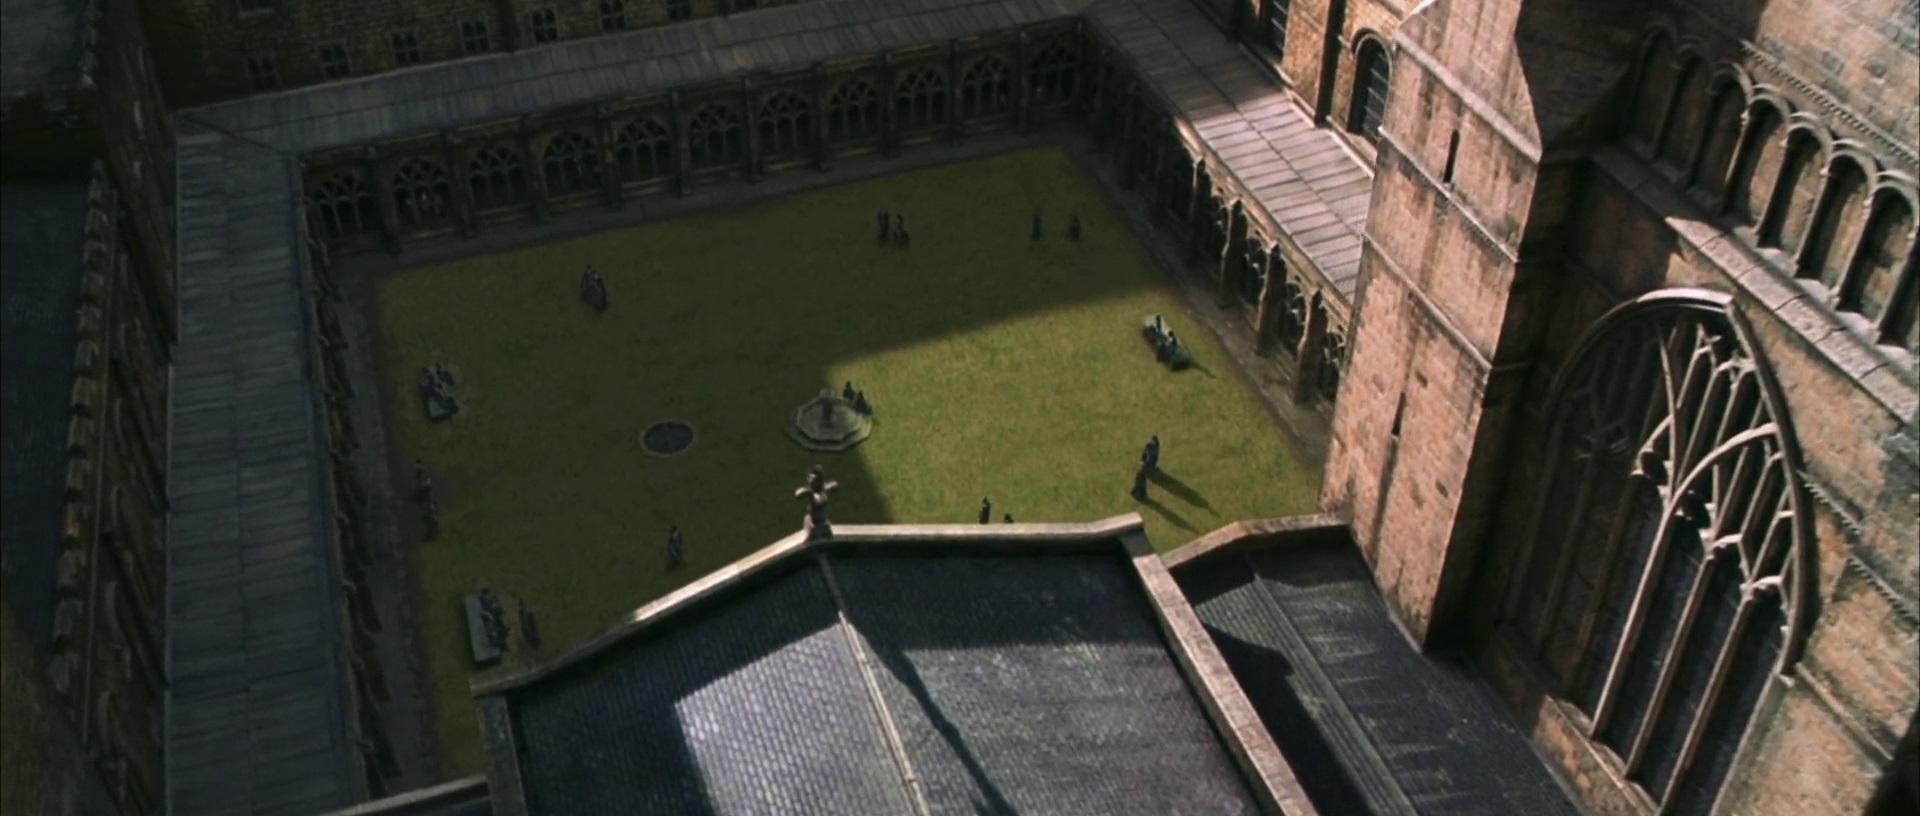 Cour de Métamorphose 2.jpg